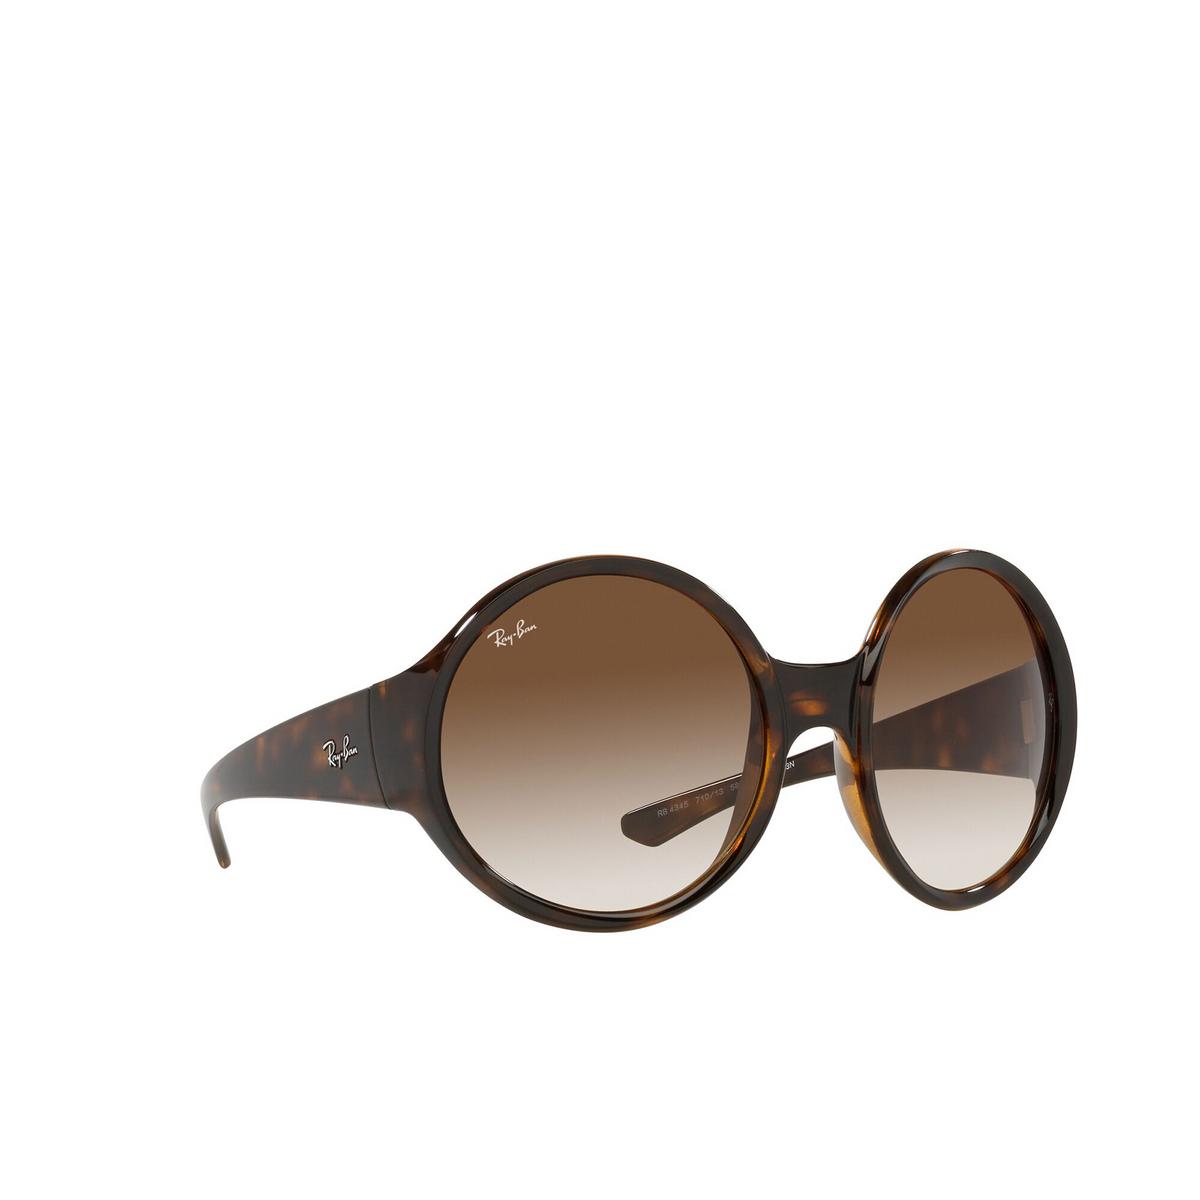 Ray-Ban® Round Sunglasses: RB4345 color Havana 710/13 - three-quarters view.